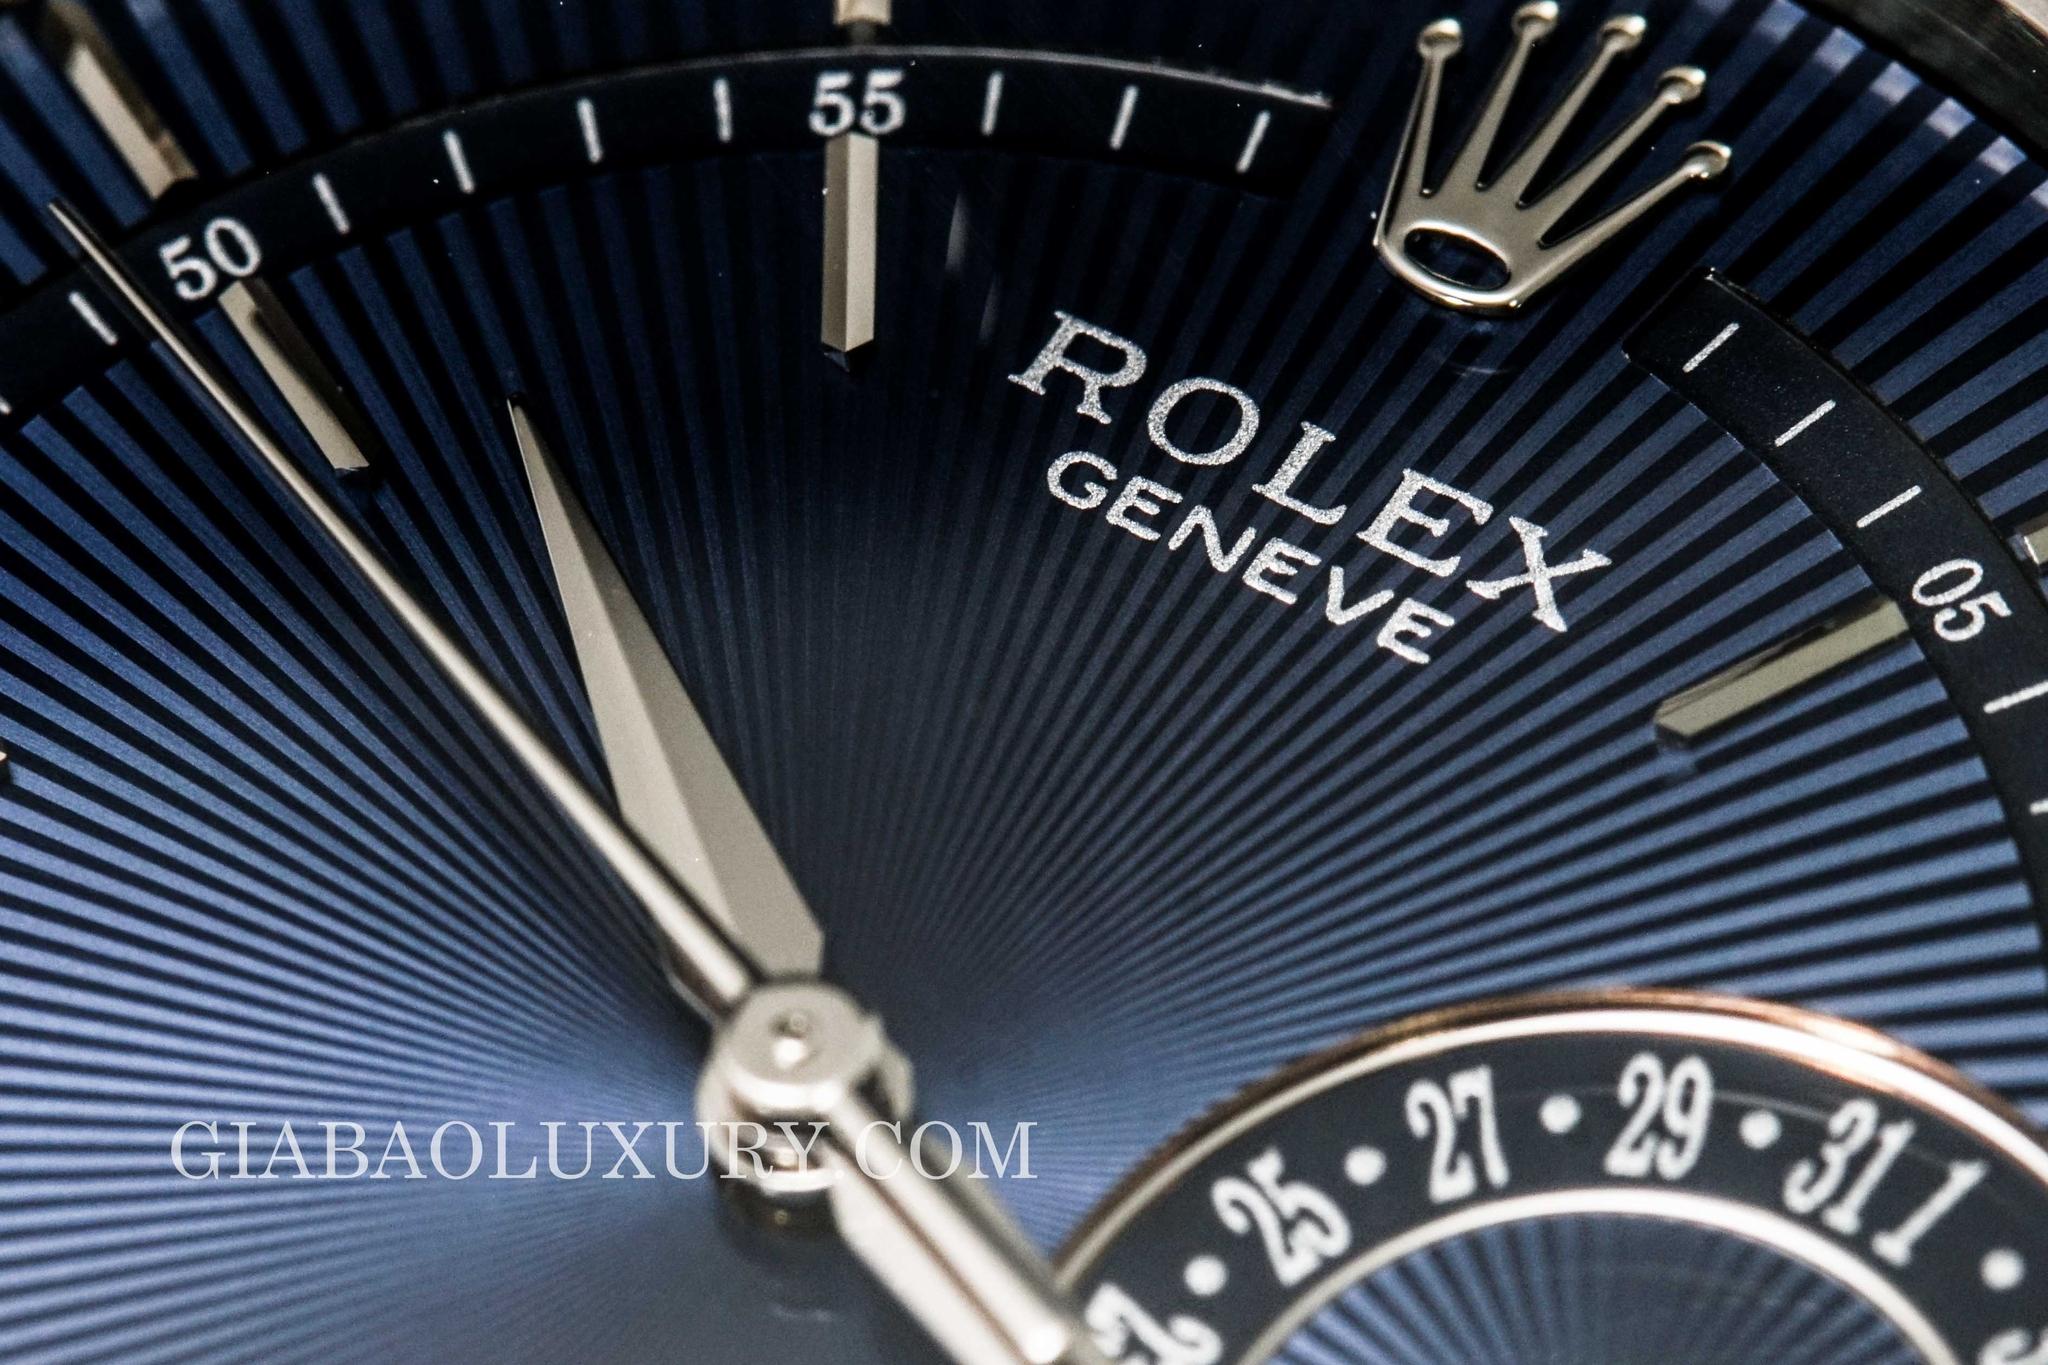 đồng hồ rolex Cellini 50519